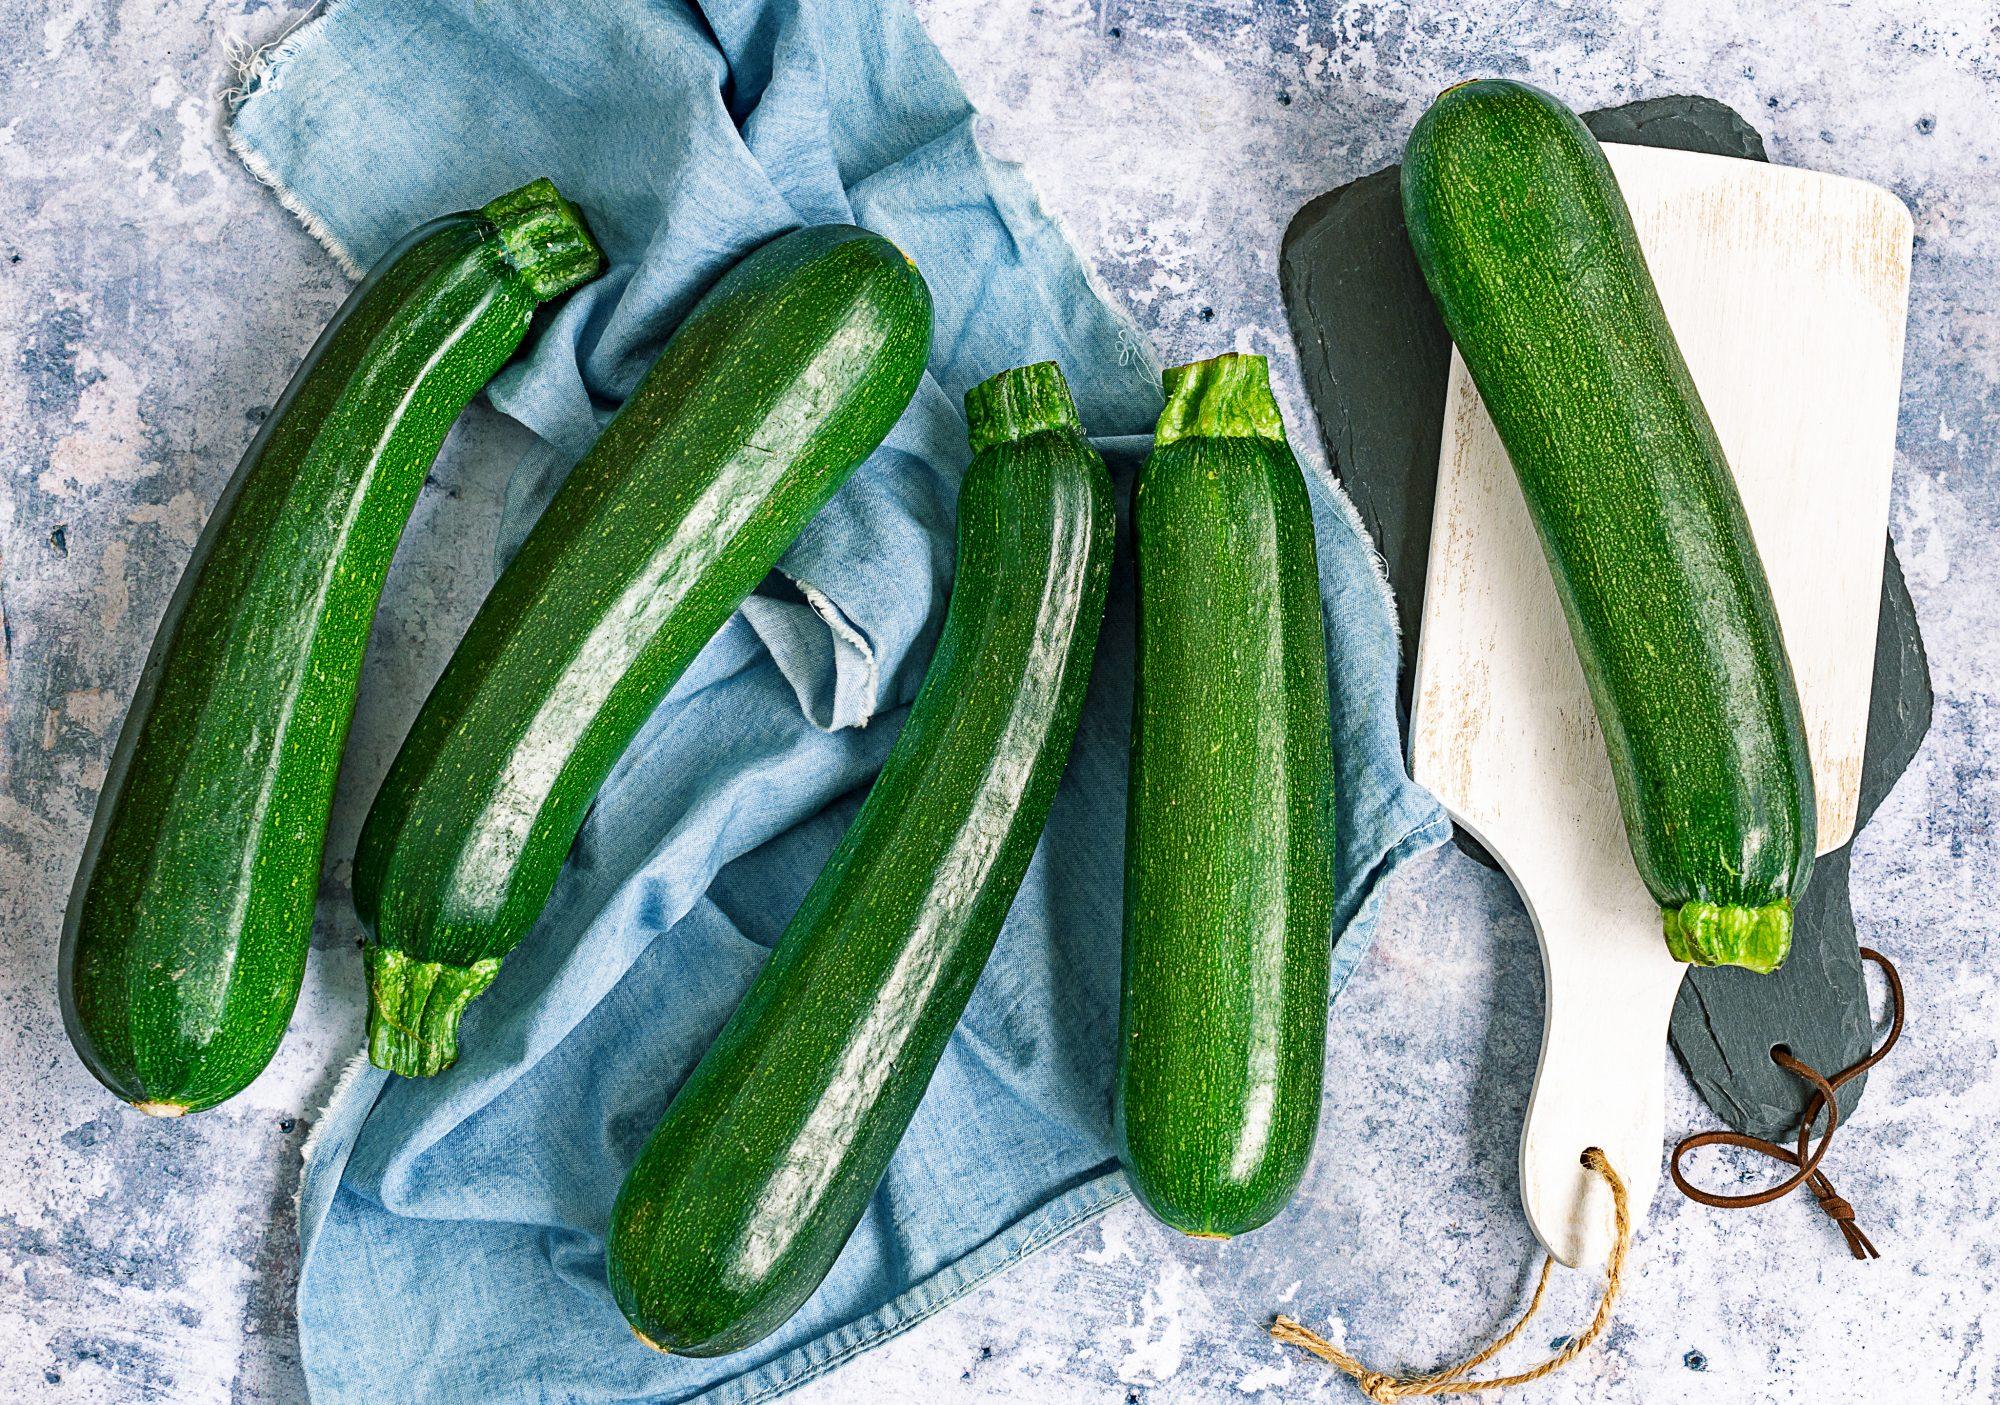 Whole zucchini Getty 6/22/20